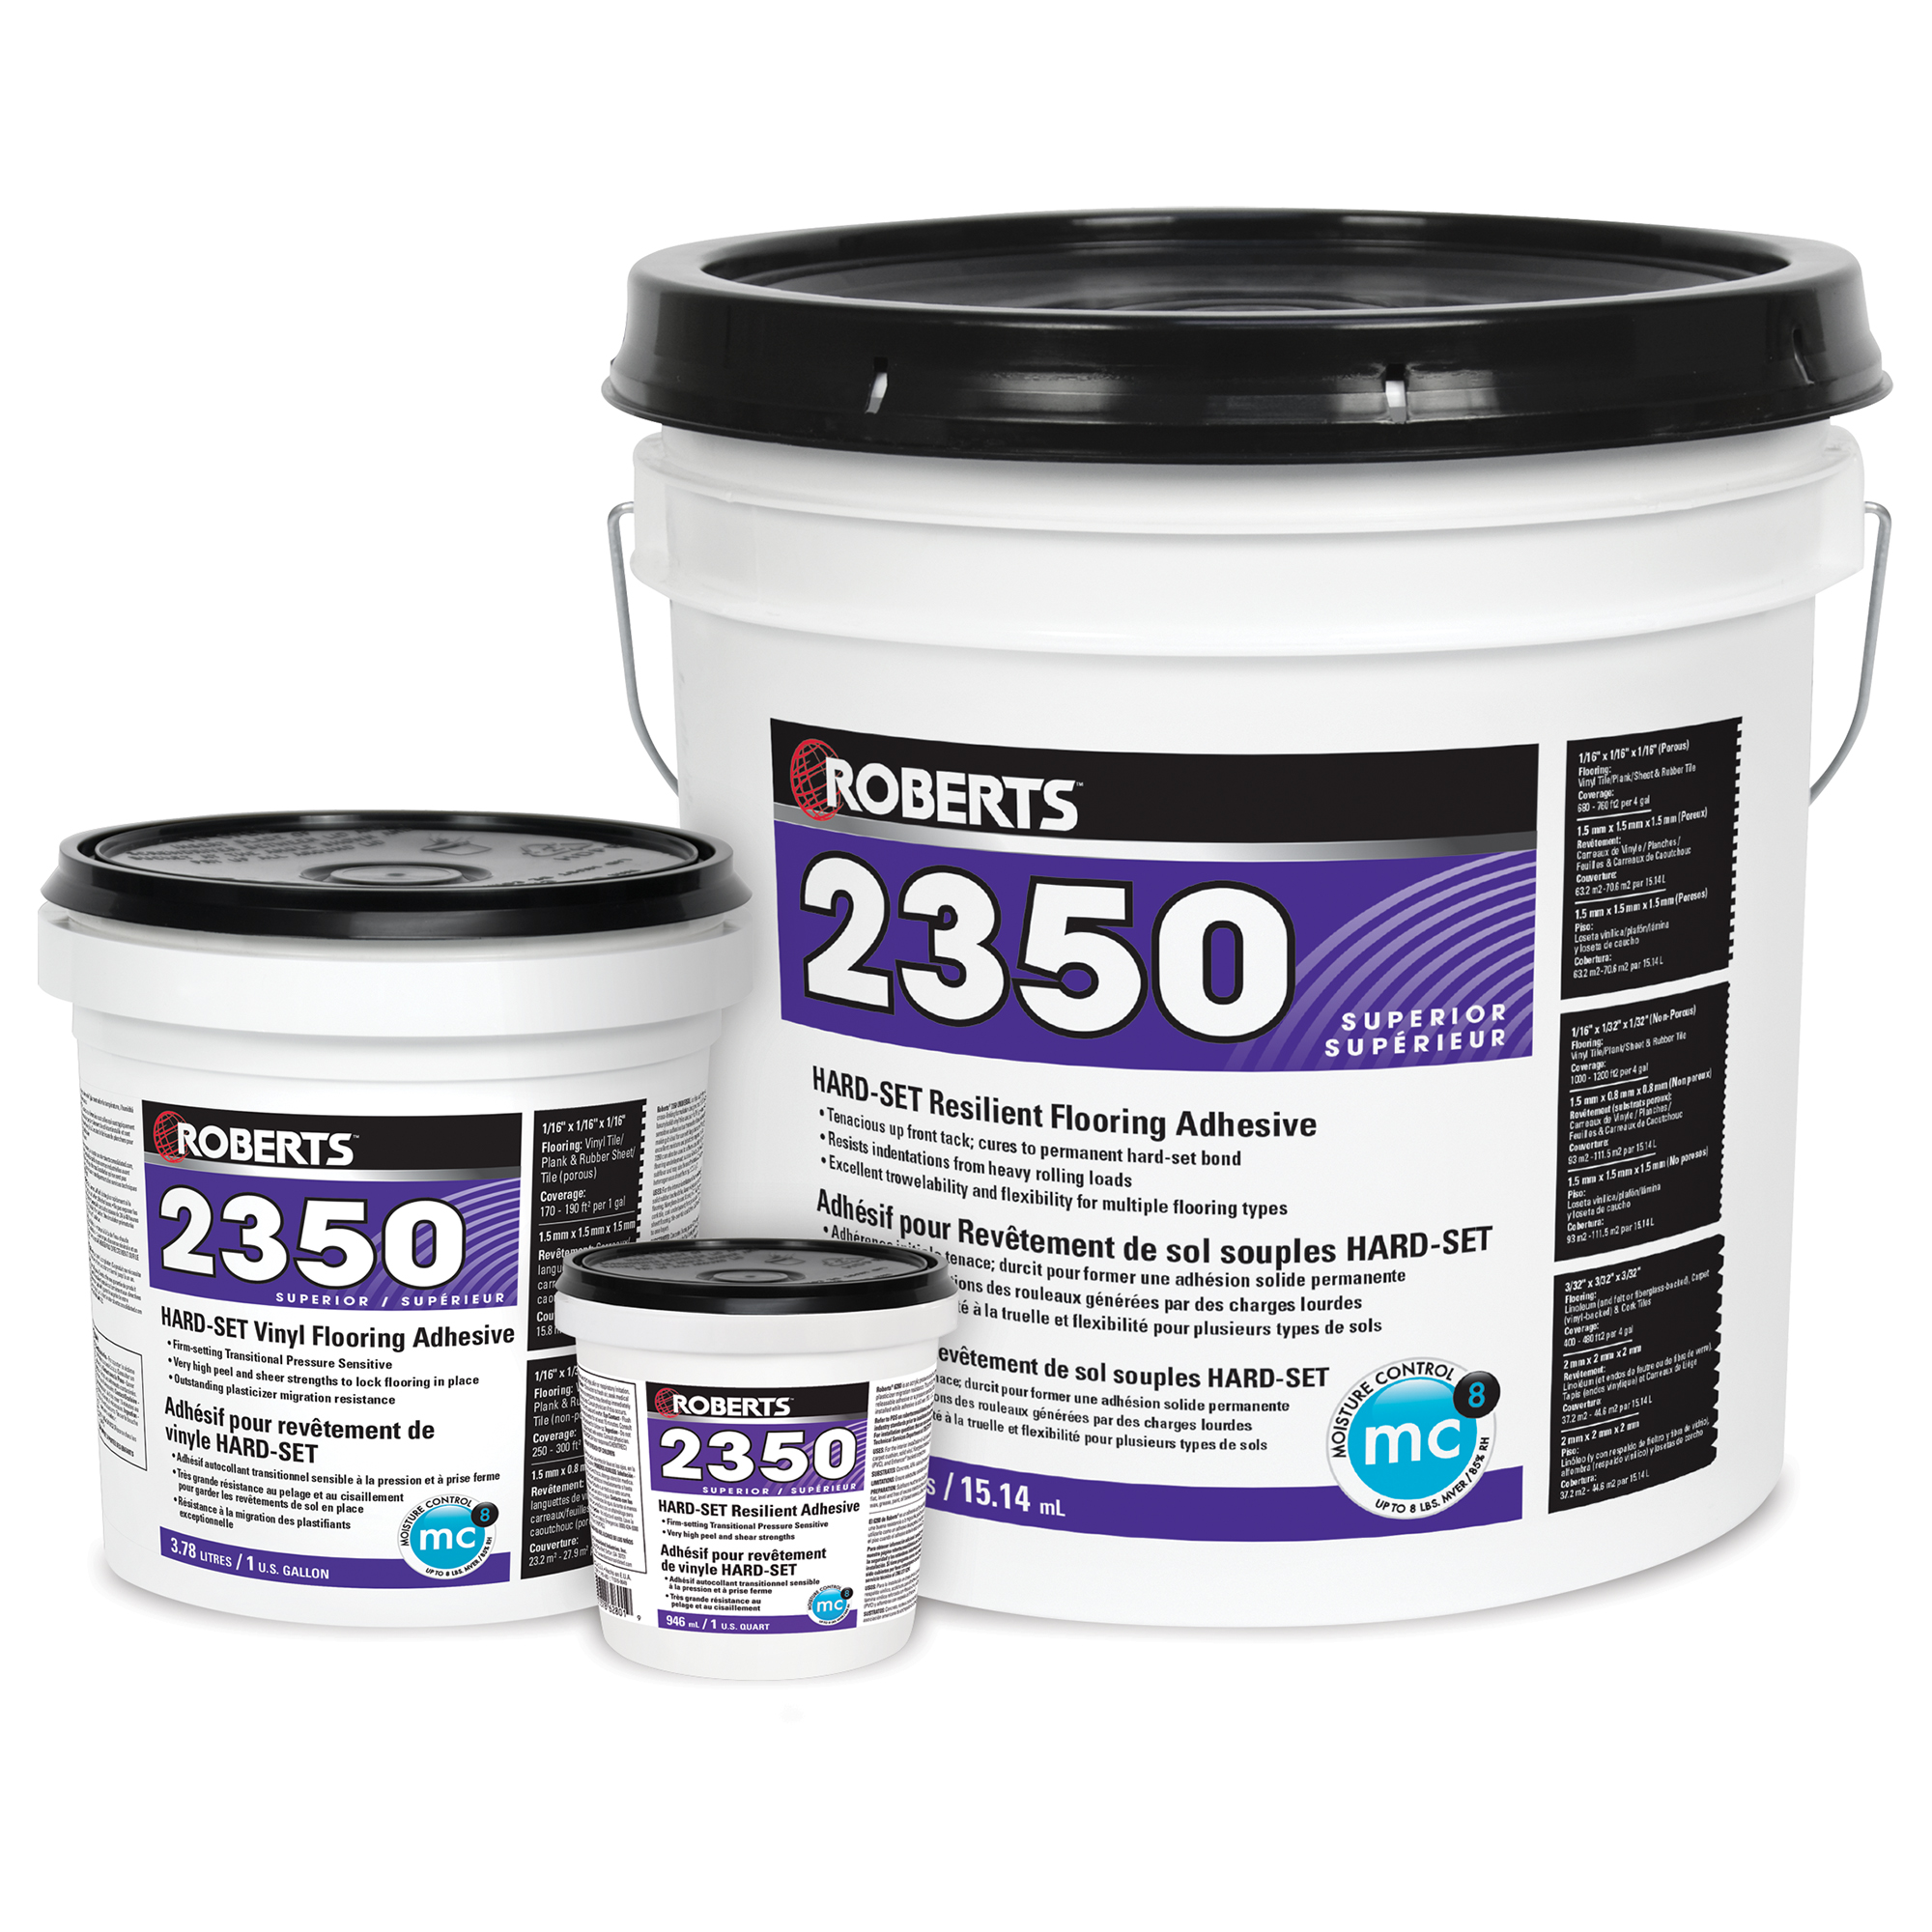 HARD-SET Resilient Flooring Adhesive